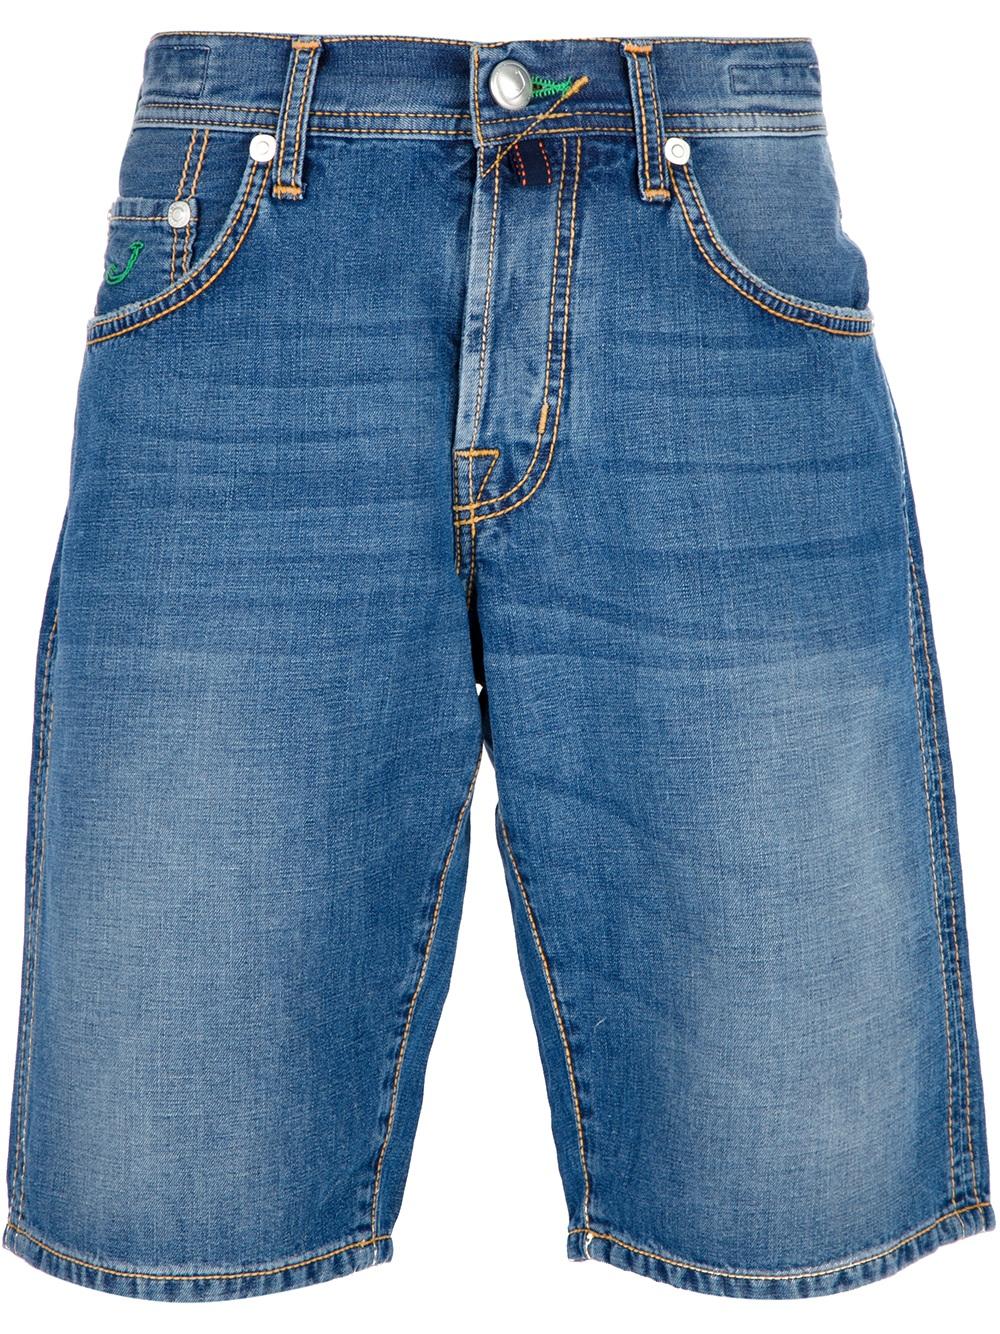 Jacob cohen denim bermuda shorts in blue for men denim - Jacob cohen denim ...